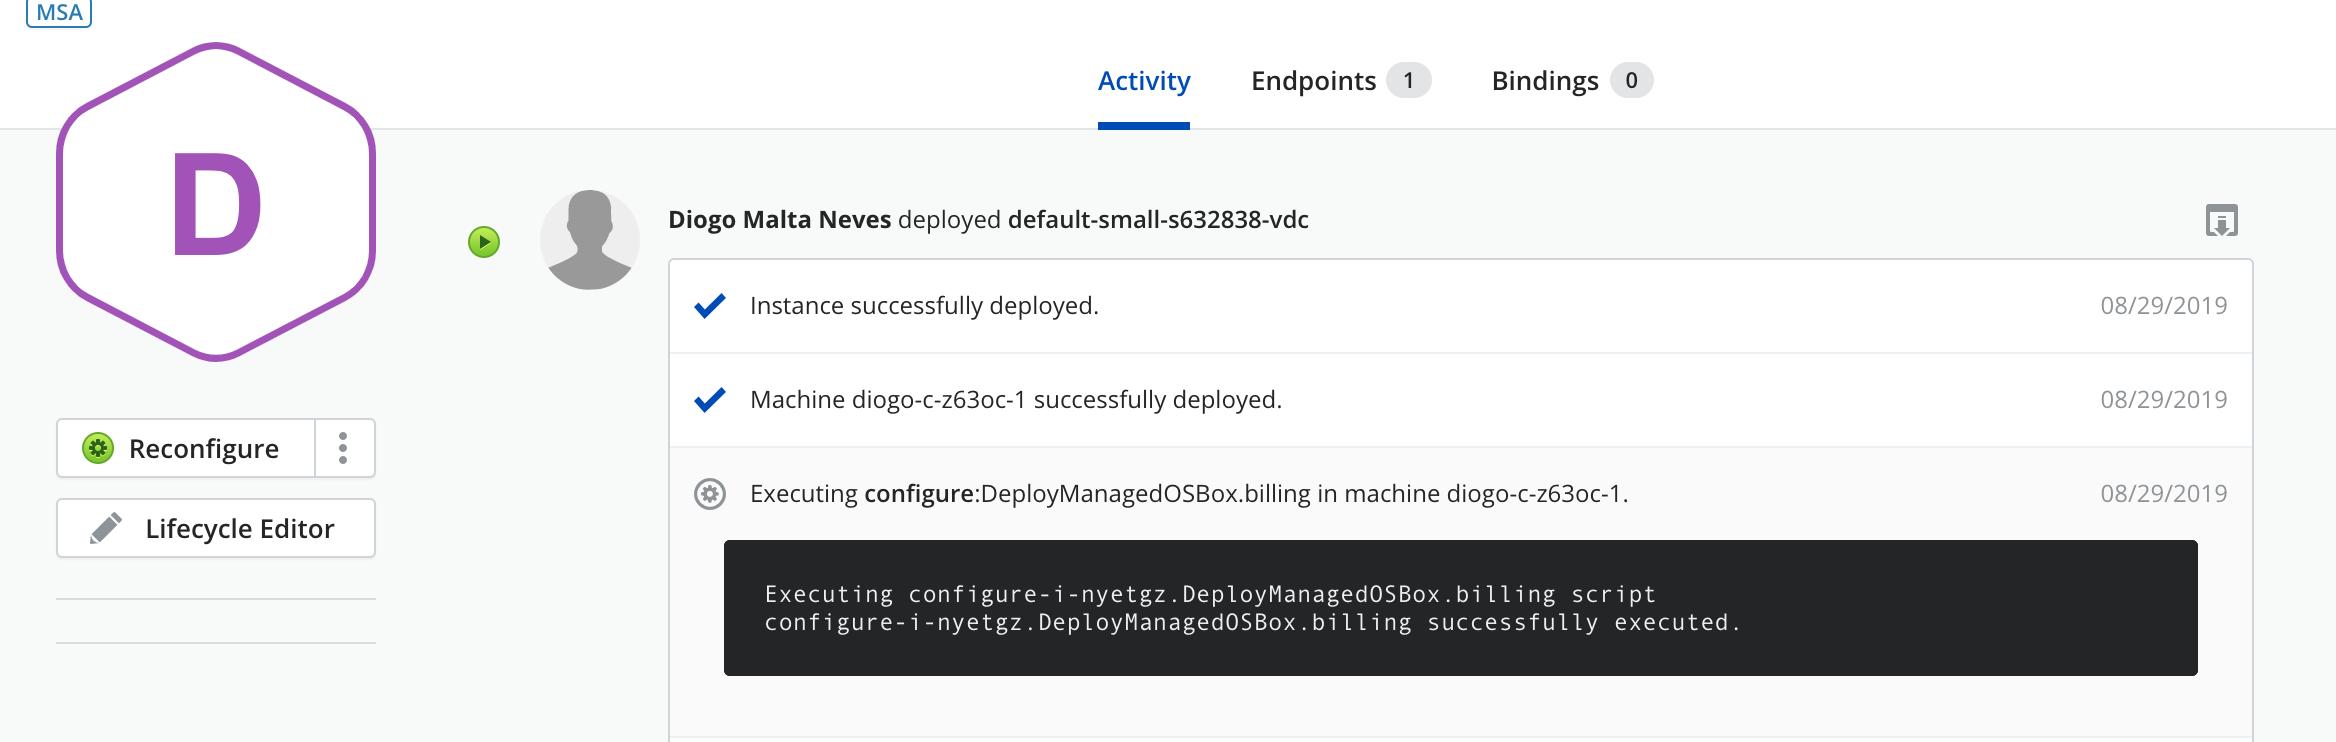 Copy agent installation script